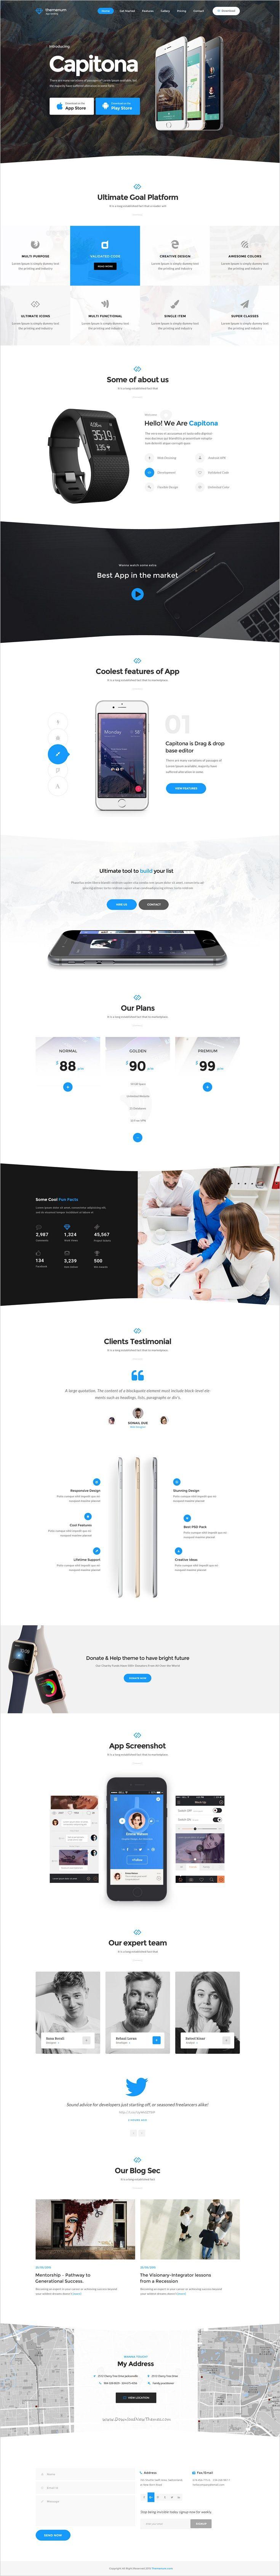 Themenum is a wonderful 6 in 1 #Bootstrap #landing page template for #app startups website download now➯ https://themeforest.net/item/themenum-multipurpose-app-showcase-responsive-html-template/17184042?ref=Datasata